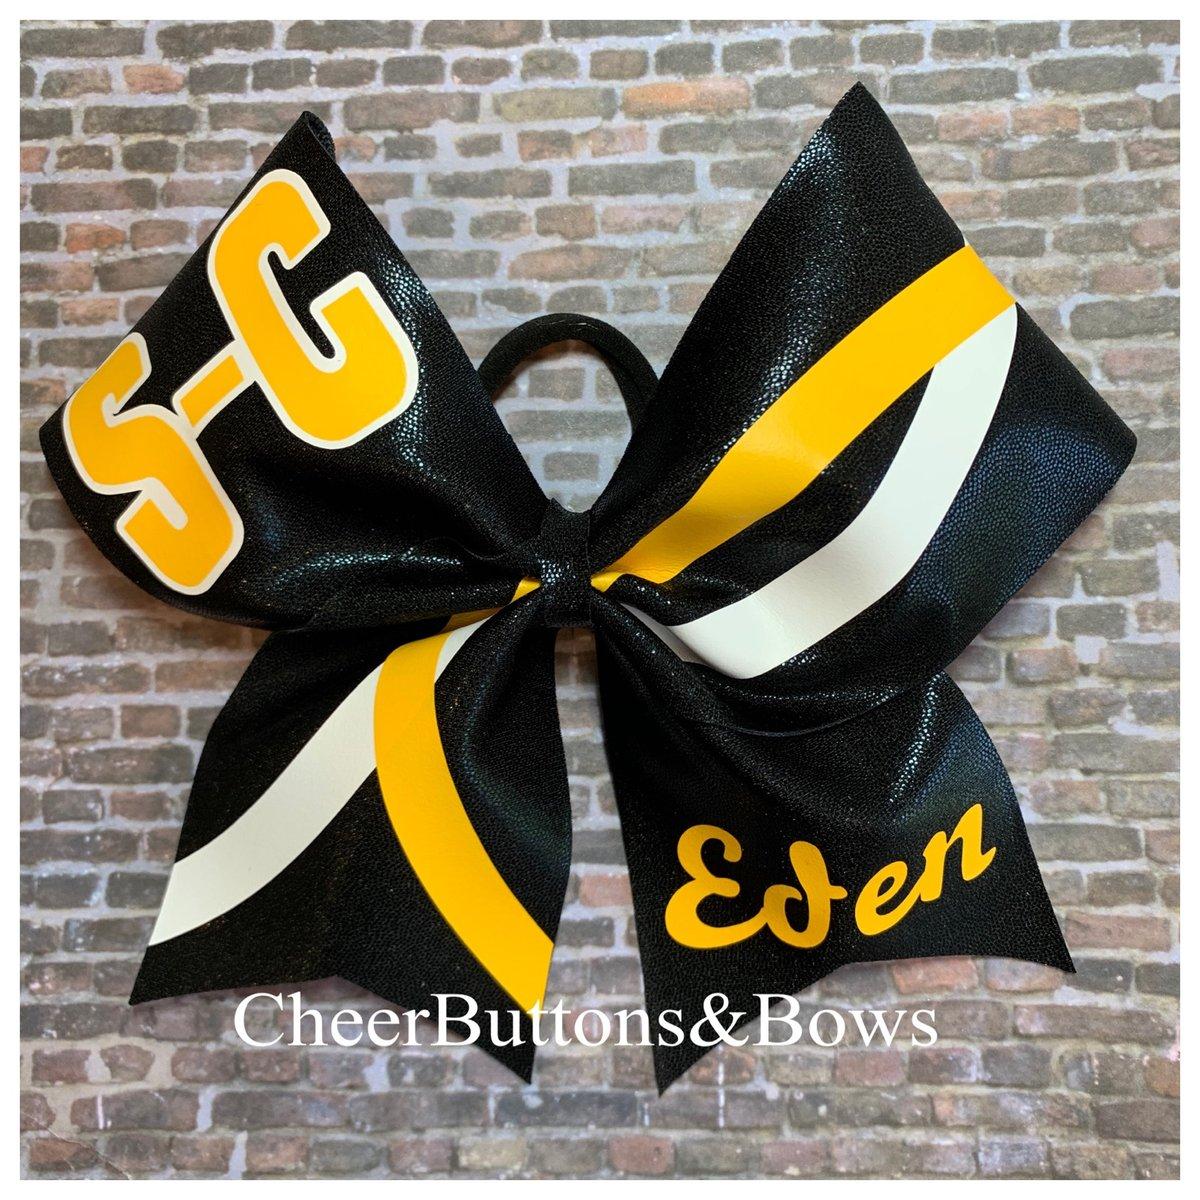 Smith-Cotton High School, Missouri team cheer bows https://soo.nr/wxOJ #cheerbow #cheerleading #cheerleader #cheerislife #cheer #cheerleader #cheercoach #cheerleaders #cheerbows #hairbows #cheerbuttonsandbowspic.twitter.com/40xqdmzLD6